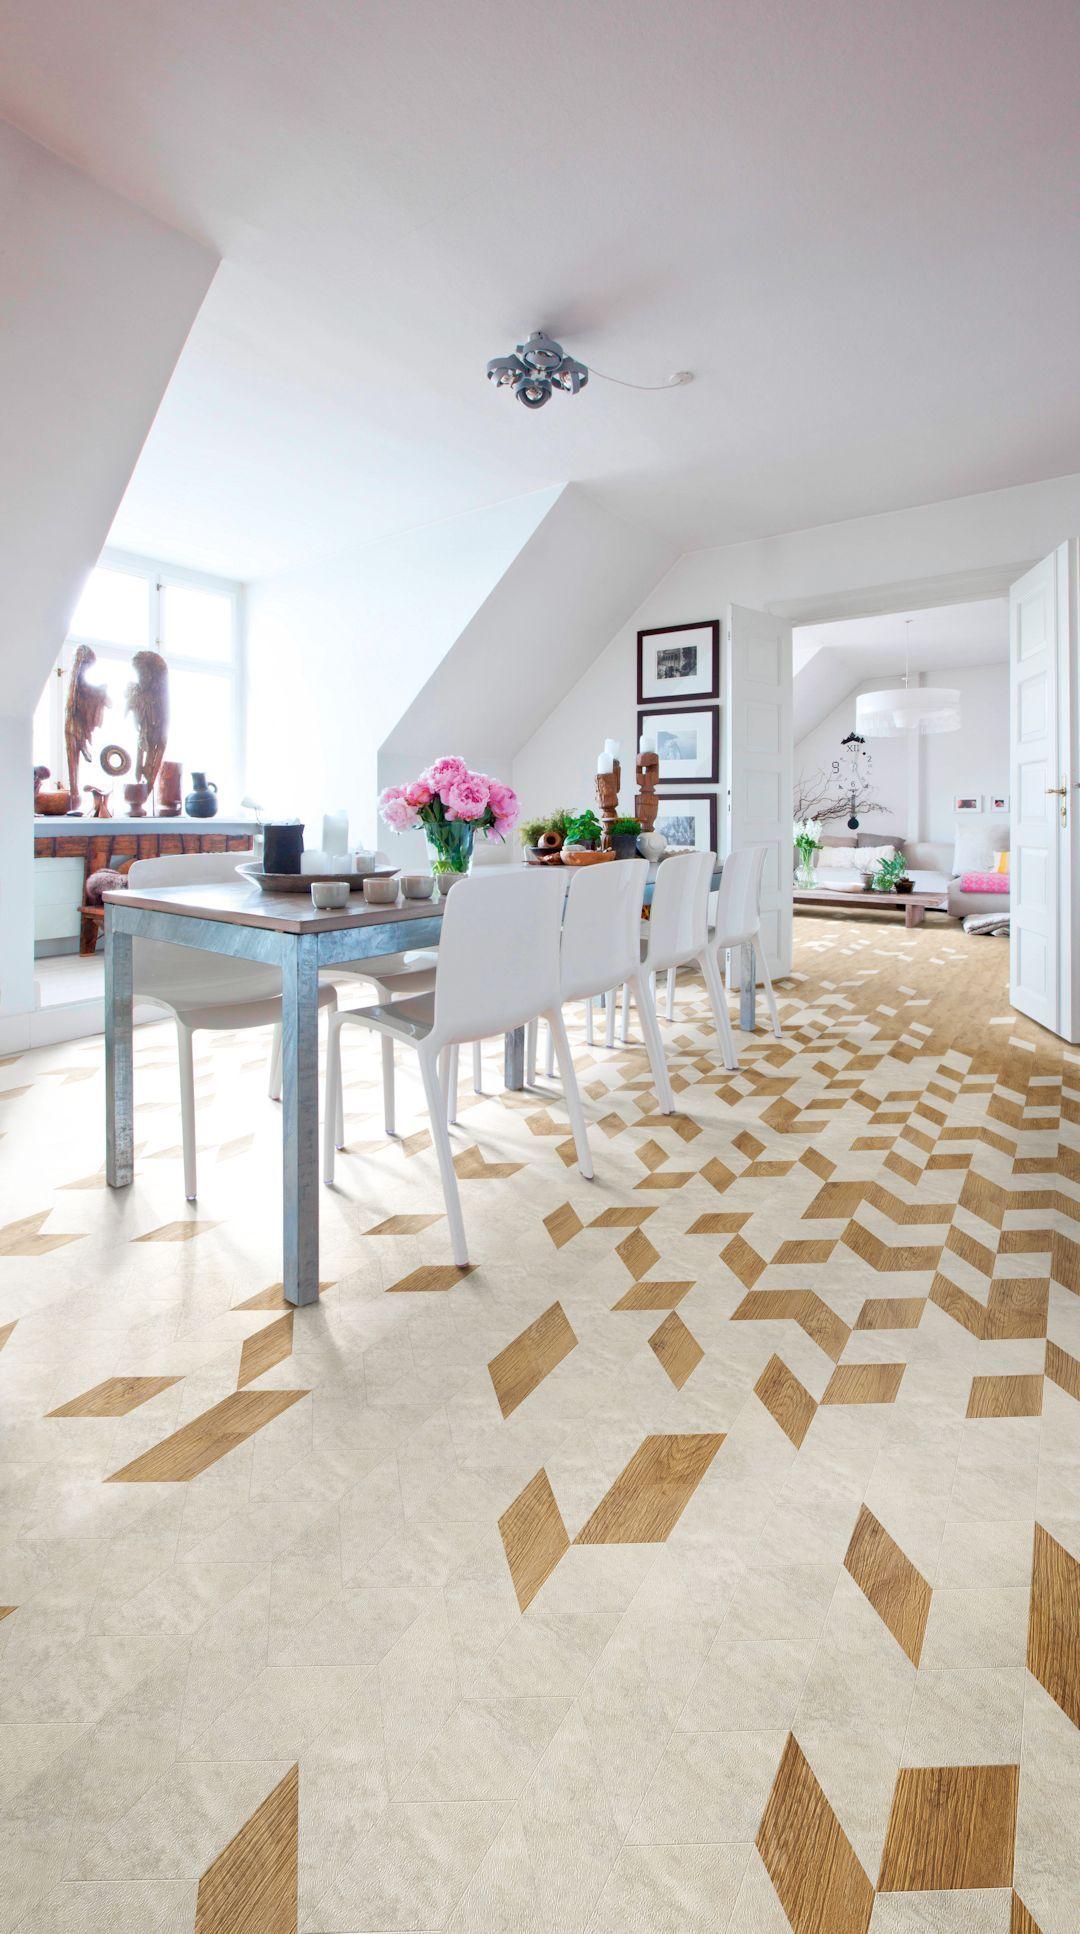 White Metalstone Camaro luxury vinyl tile flooring in